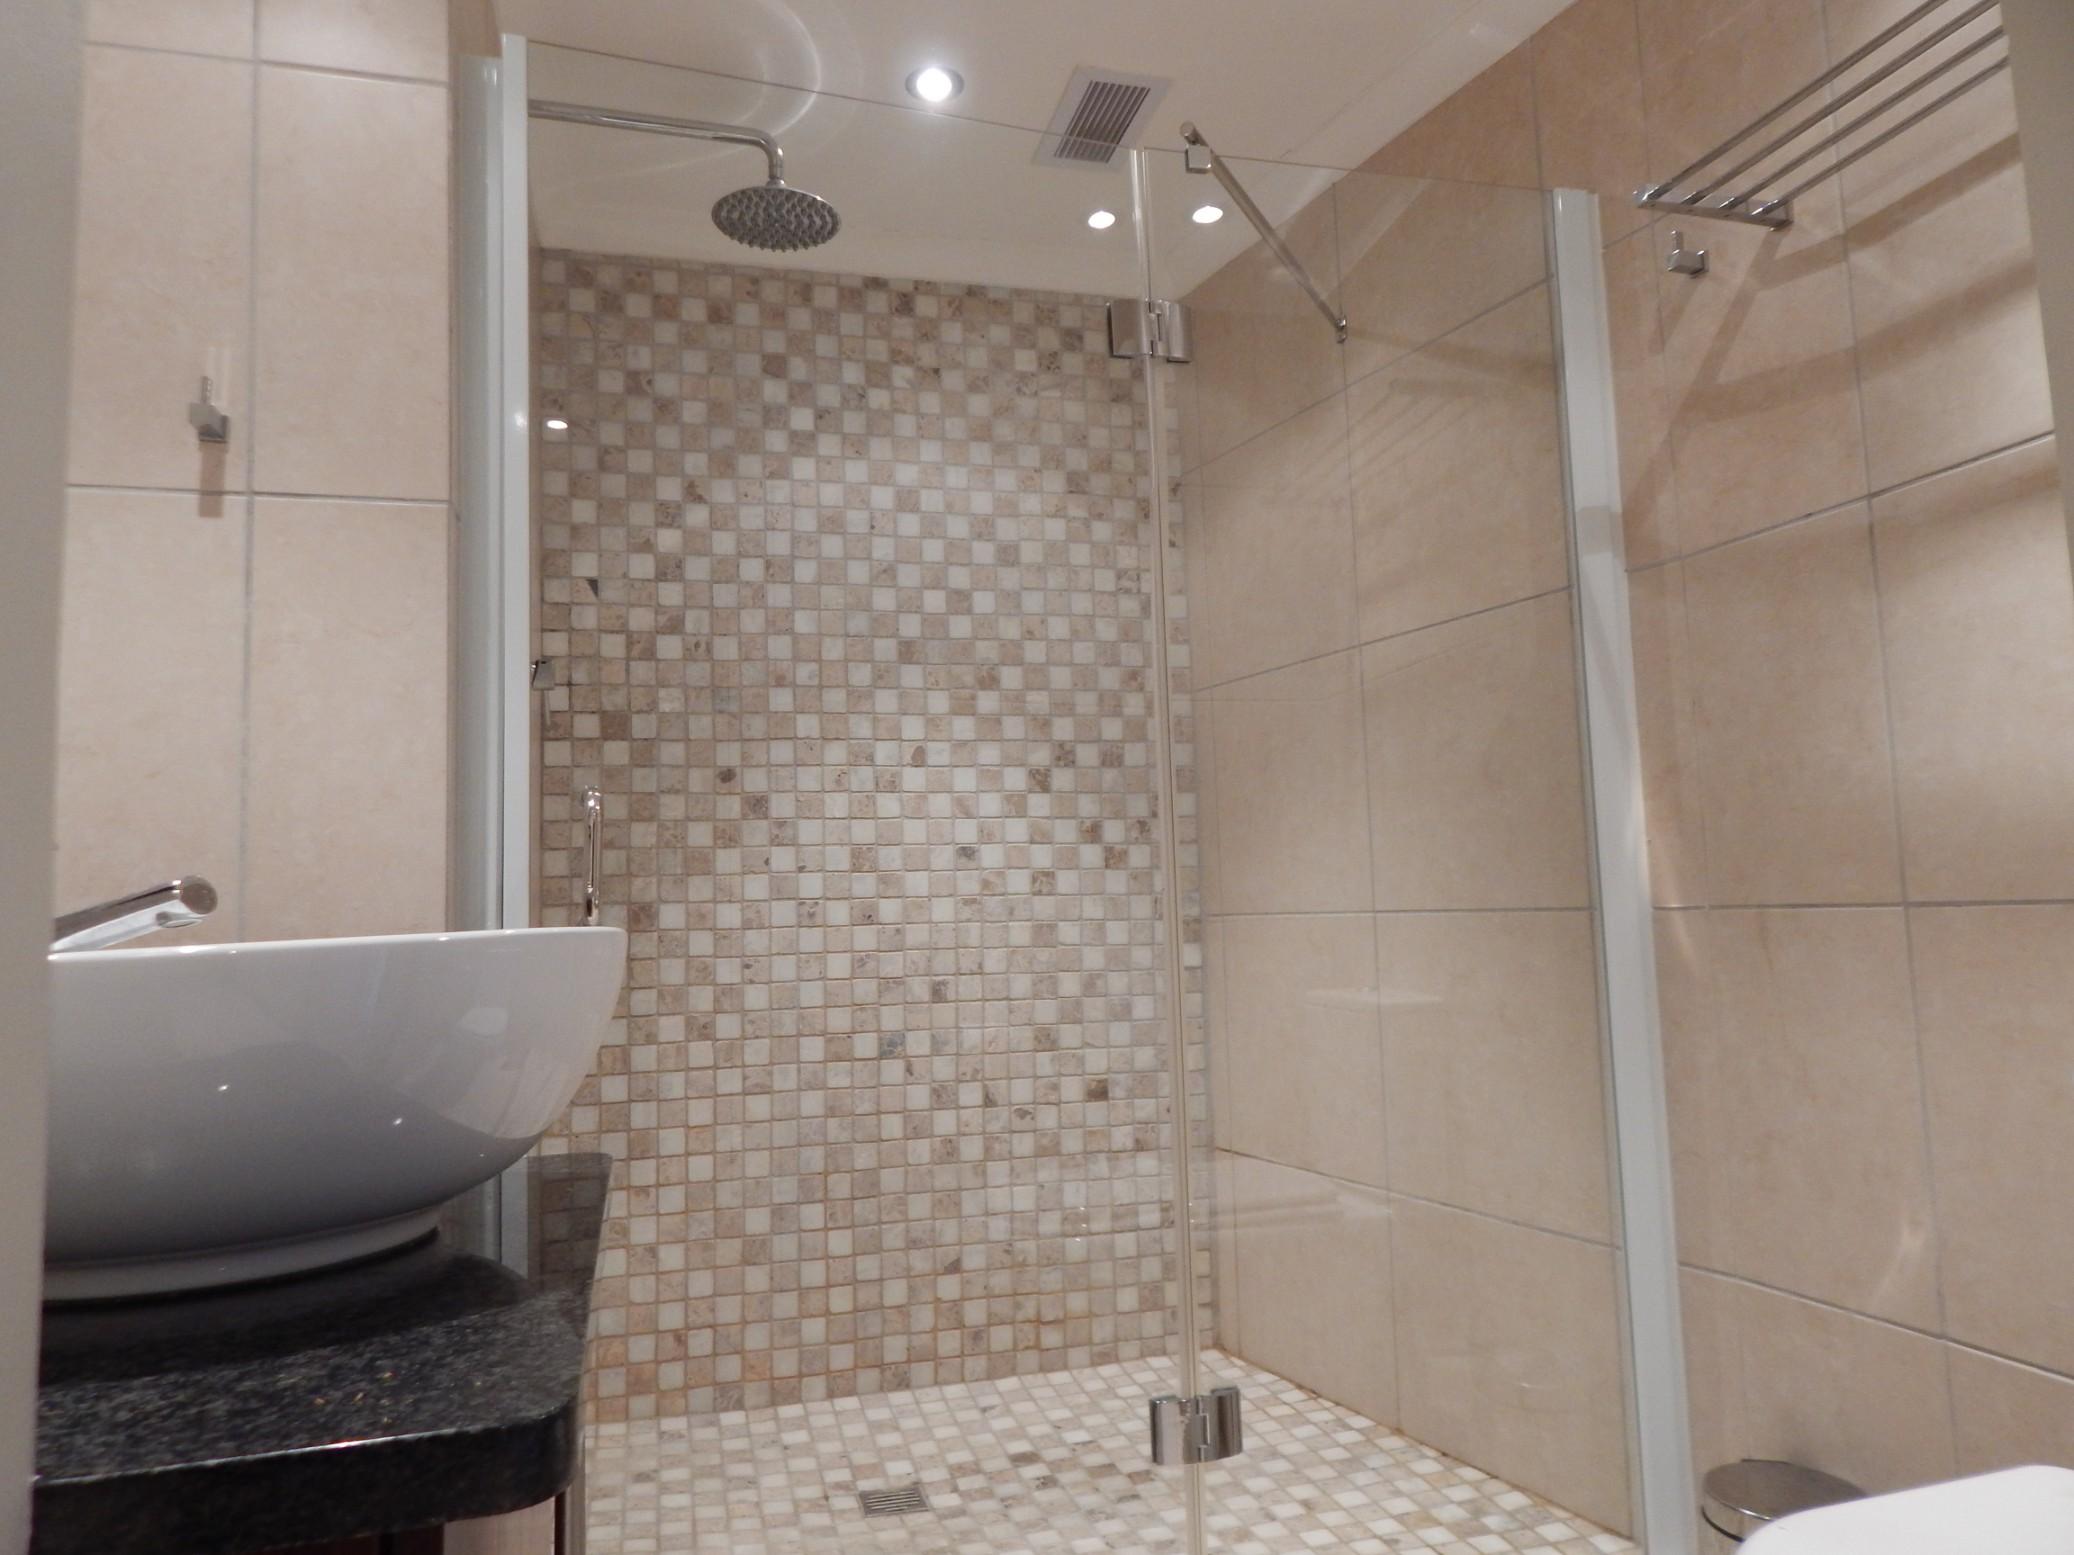 2 Bedroom Apartment for sale in De Bakke ENT0067862 : photo#12